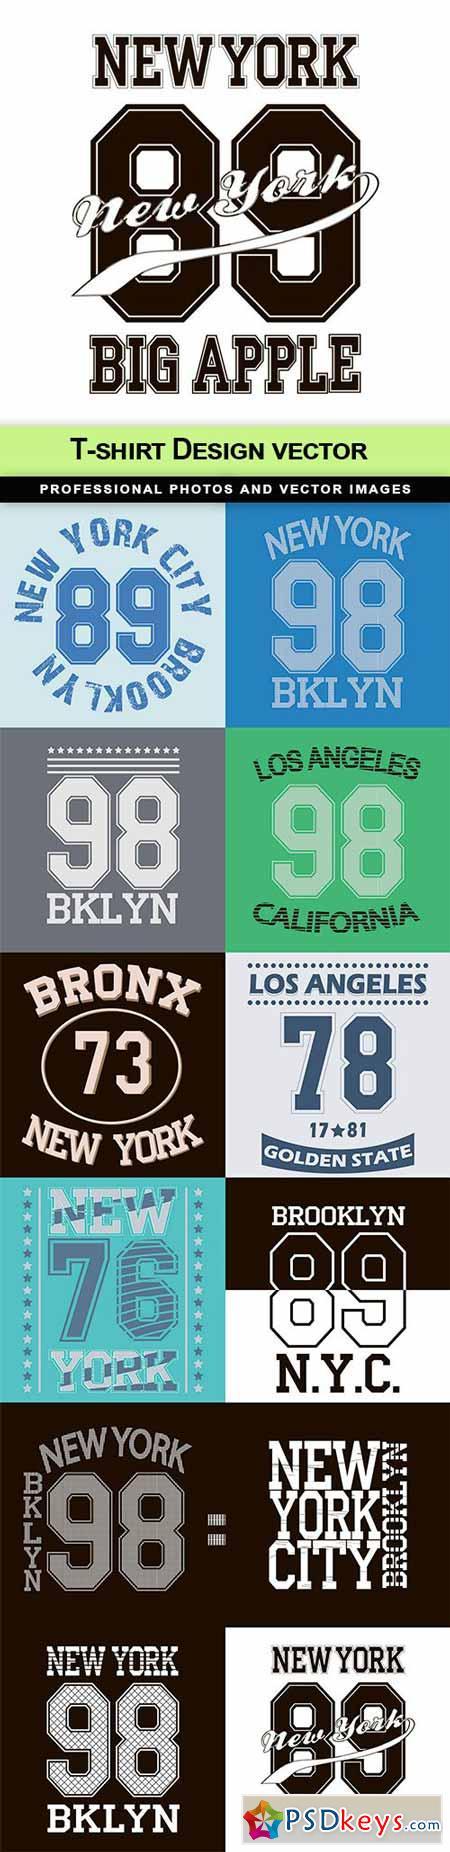 T-shirt Design vector - 12 EPS